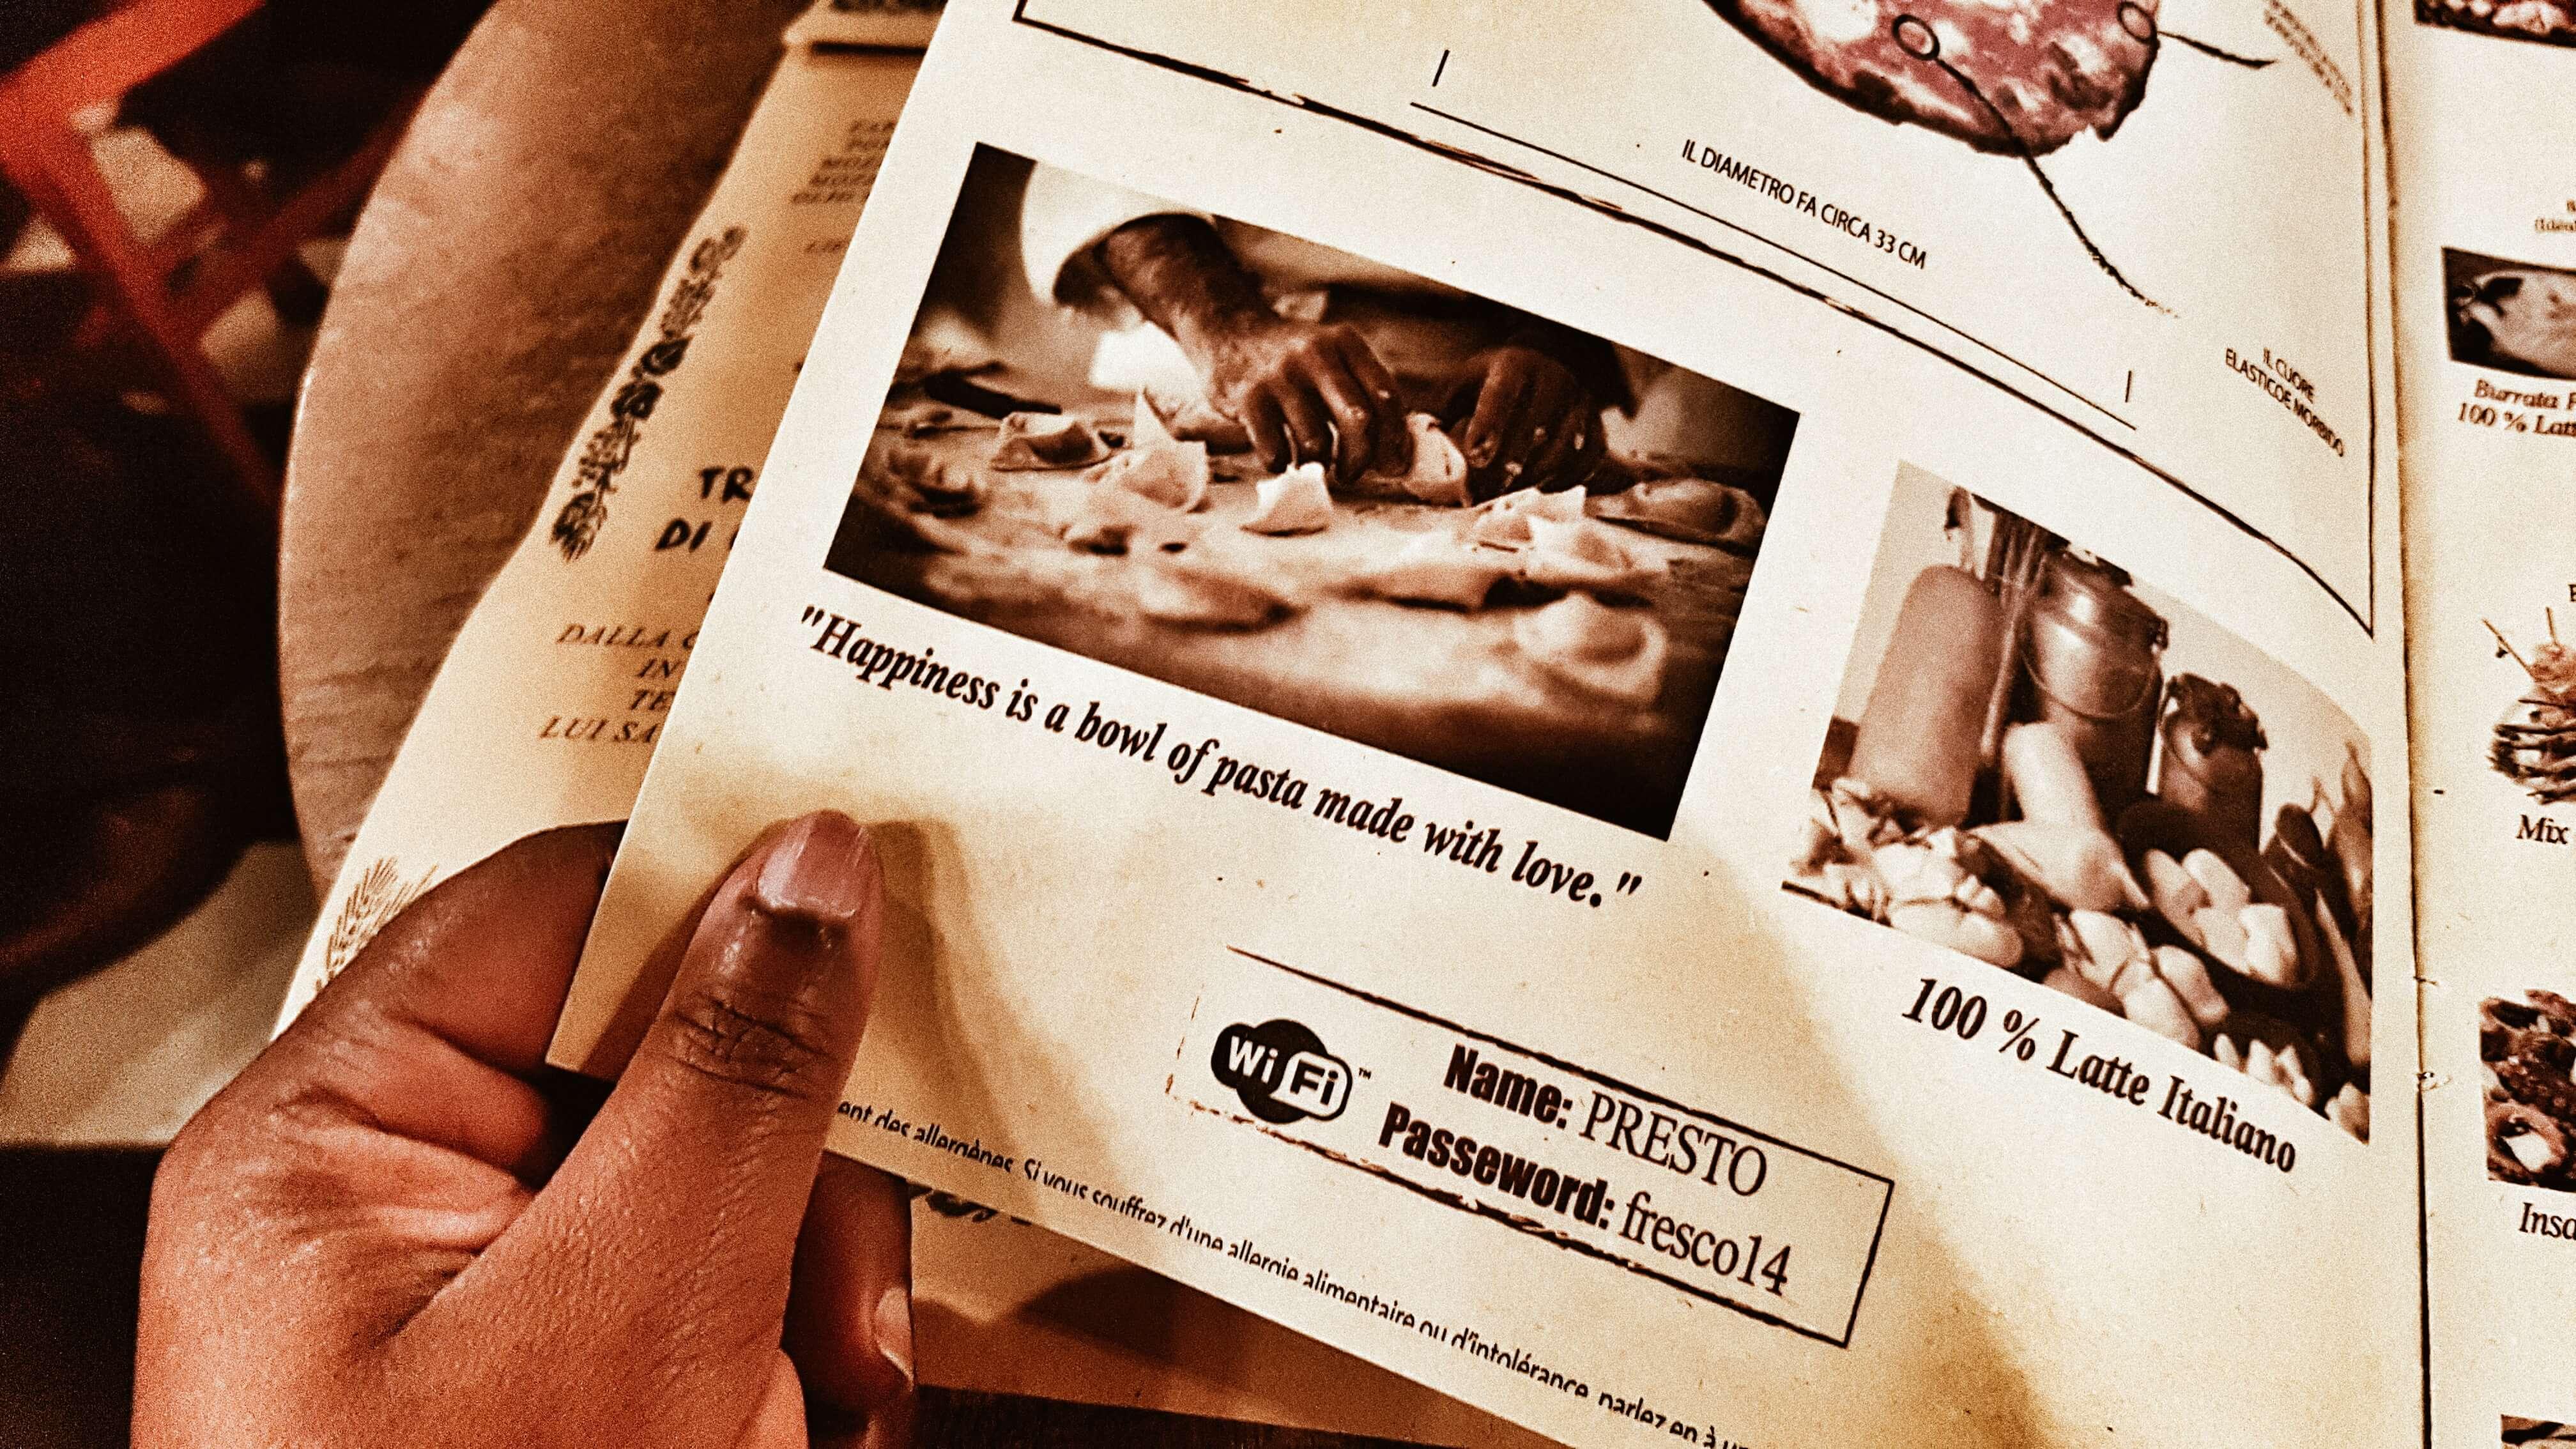 cotonettes_lifestyle_restaurant-italien_Lafourchette_presto-fresco